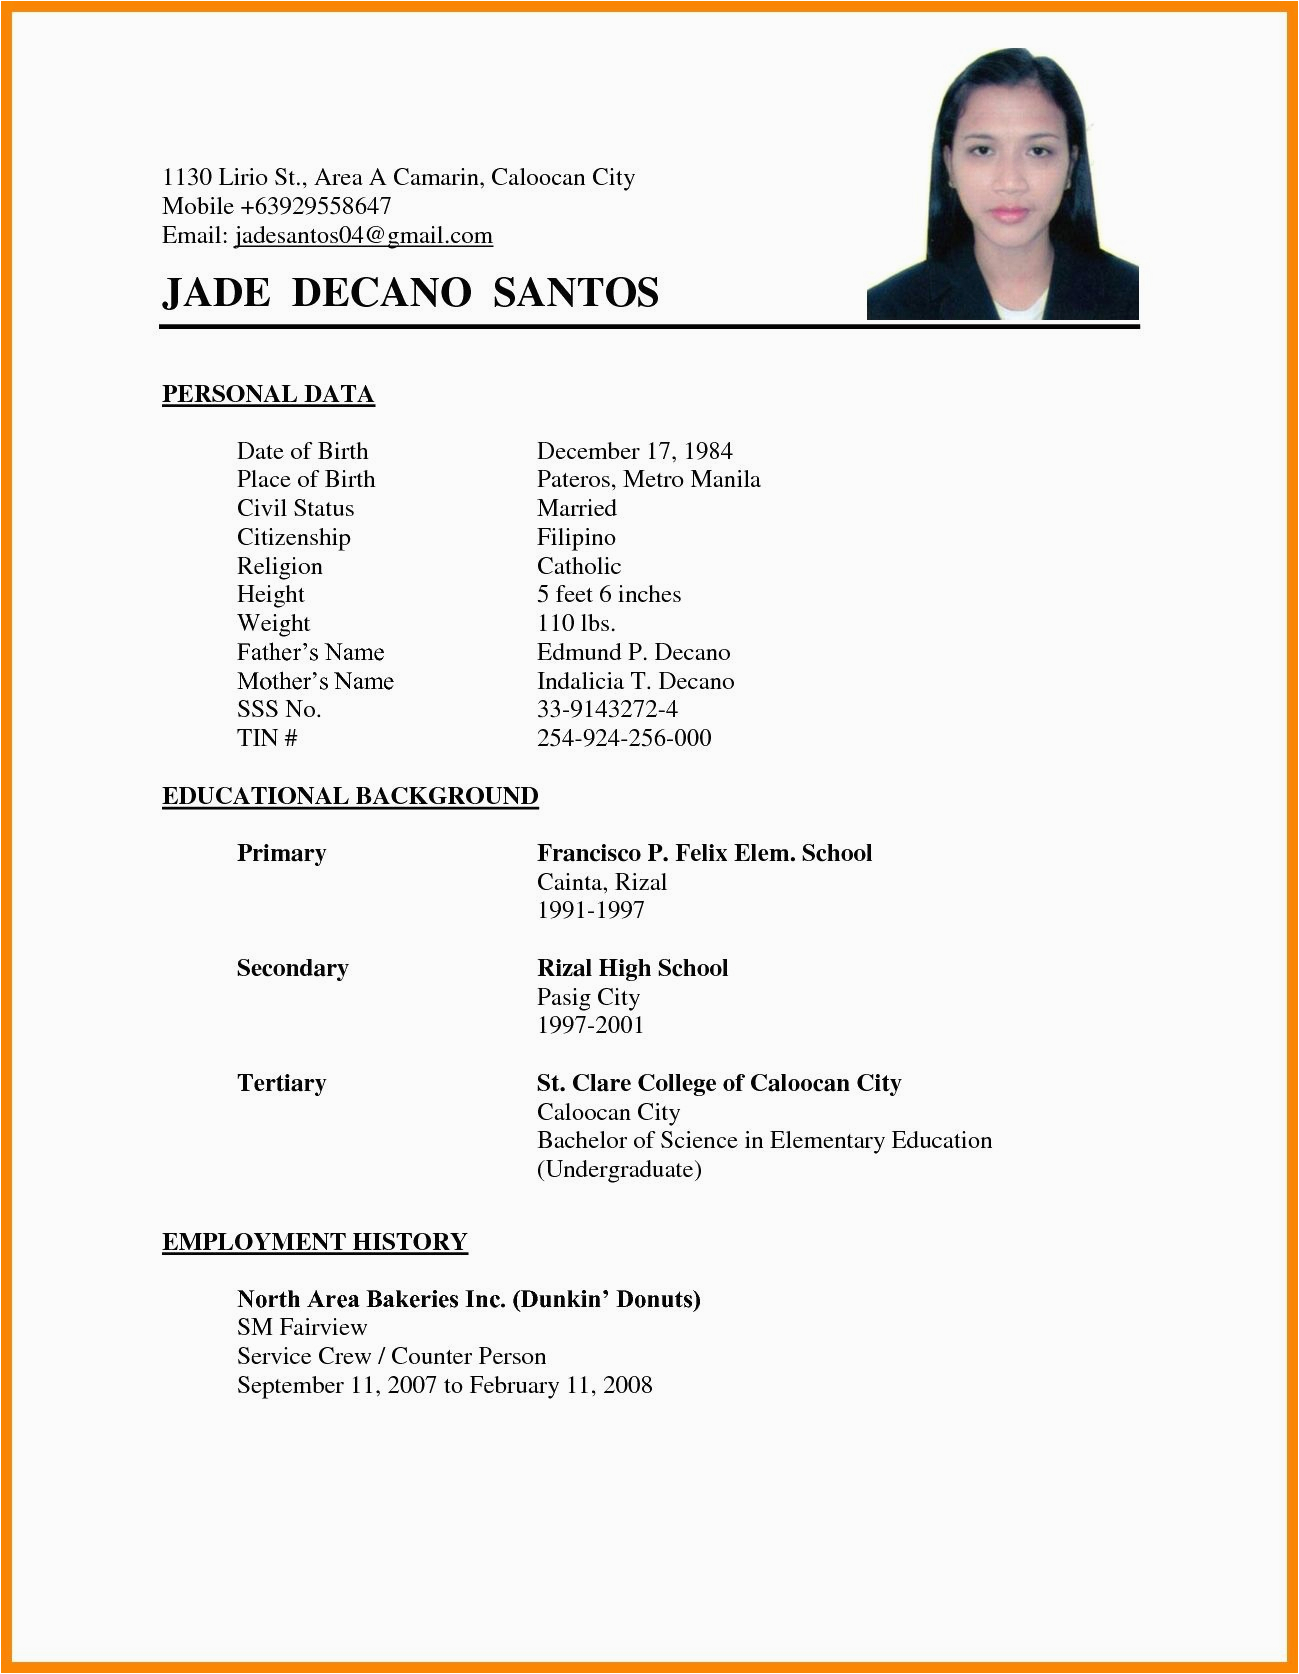 Sample Resume for Job Application Abroad Work Abroad Resume format for Abroad Job Best Resume